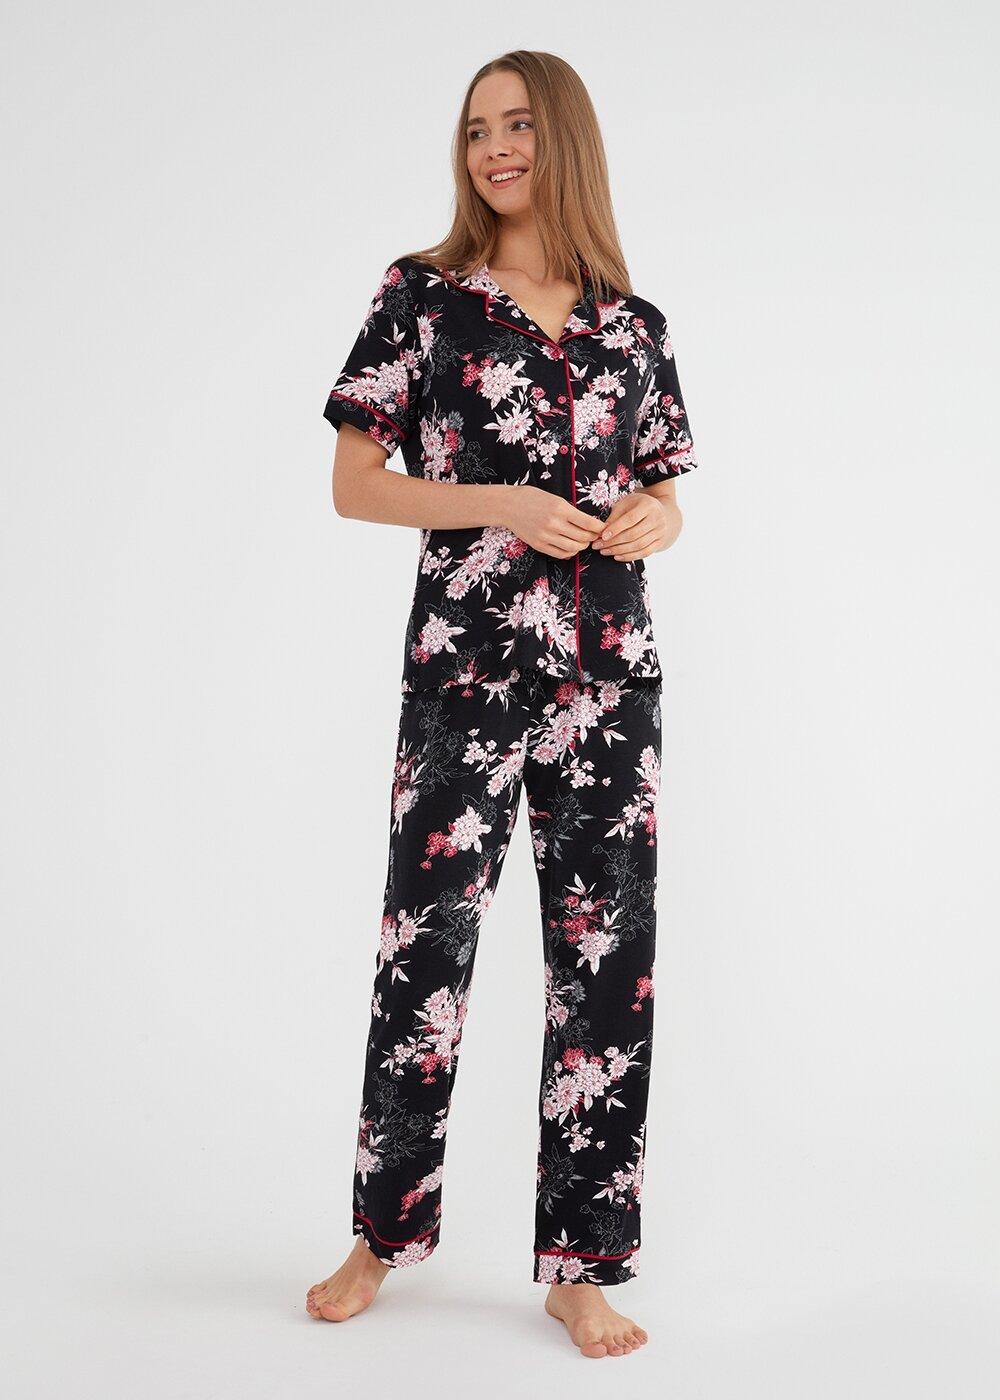 resm Felicity Maskulen Pijama Takımı - SİYAH BASKILI